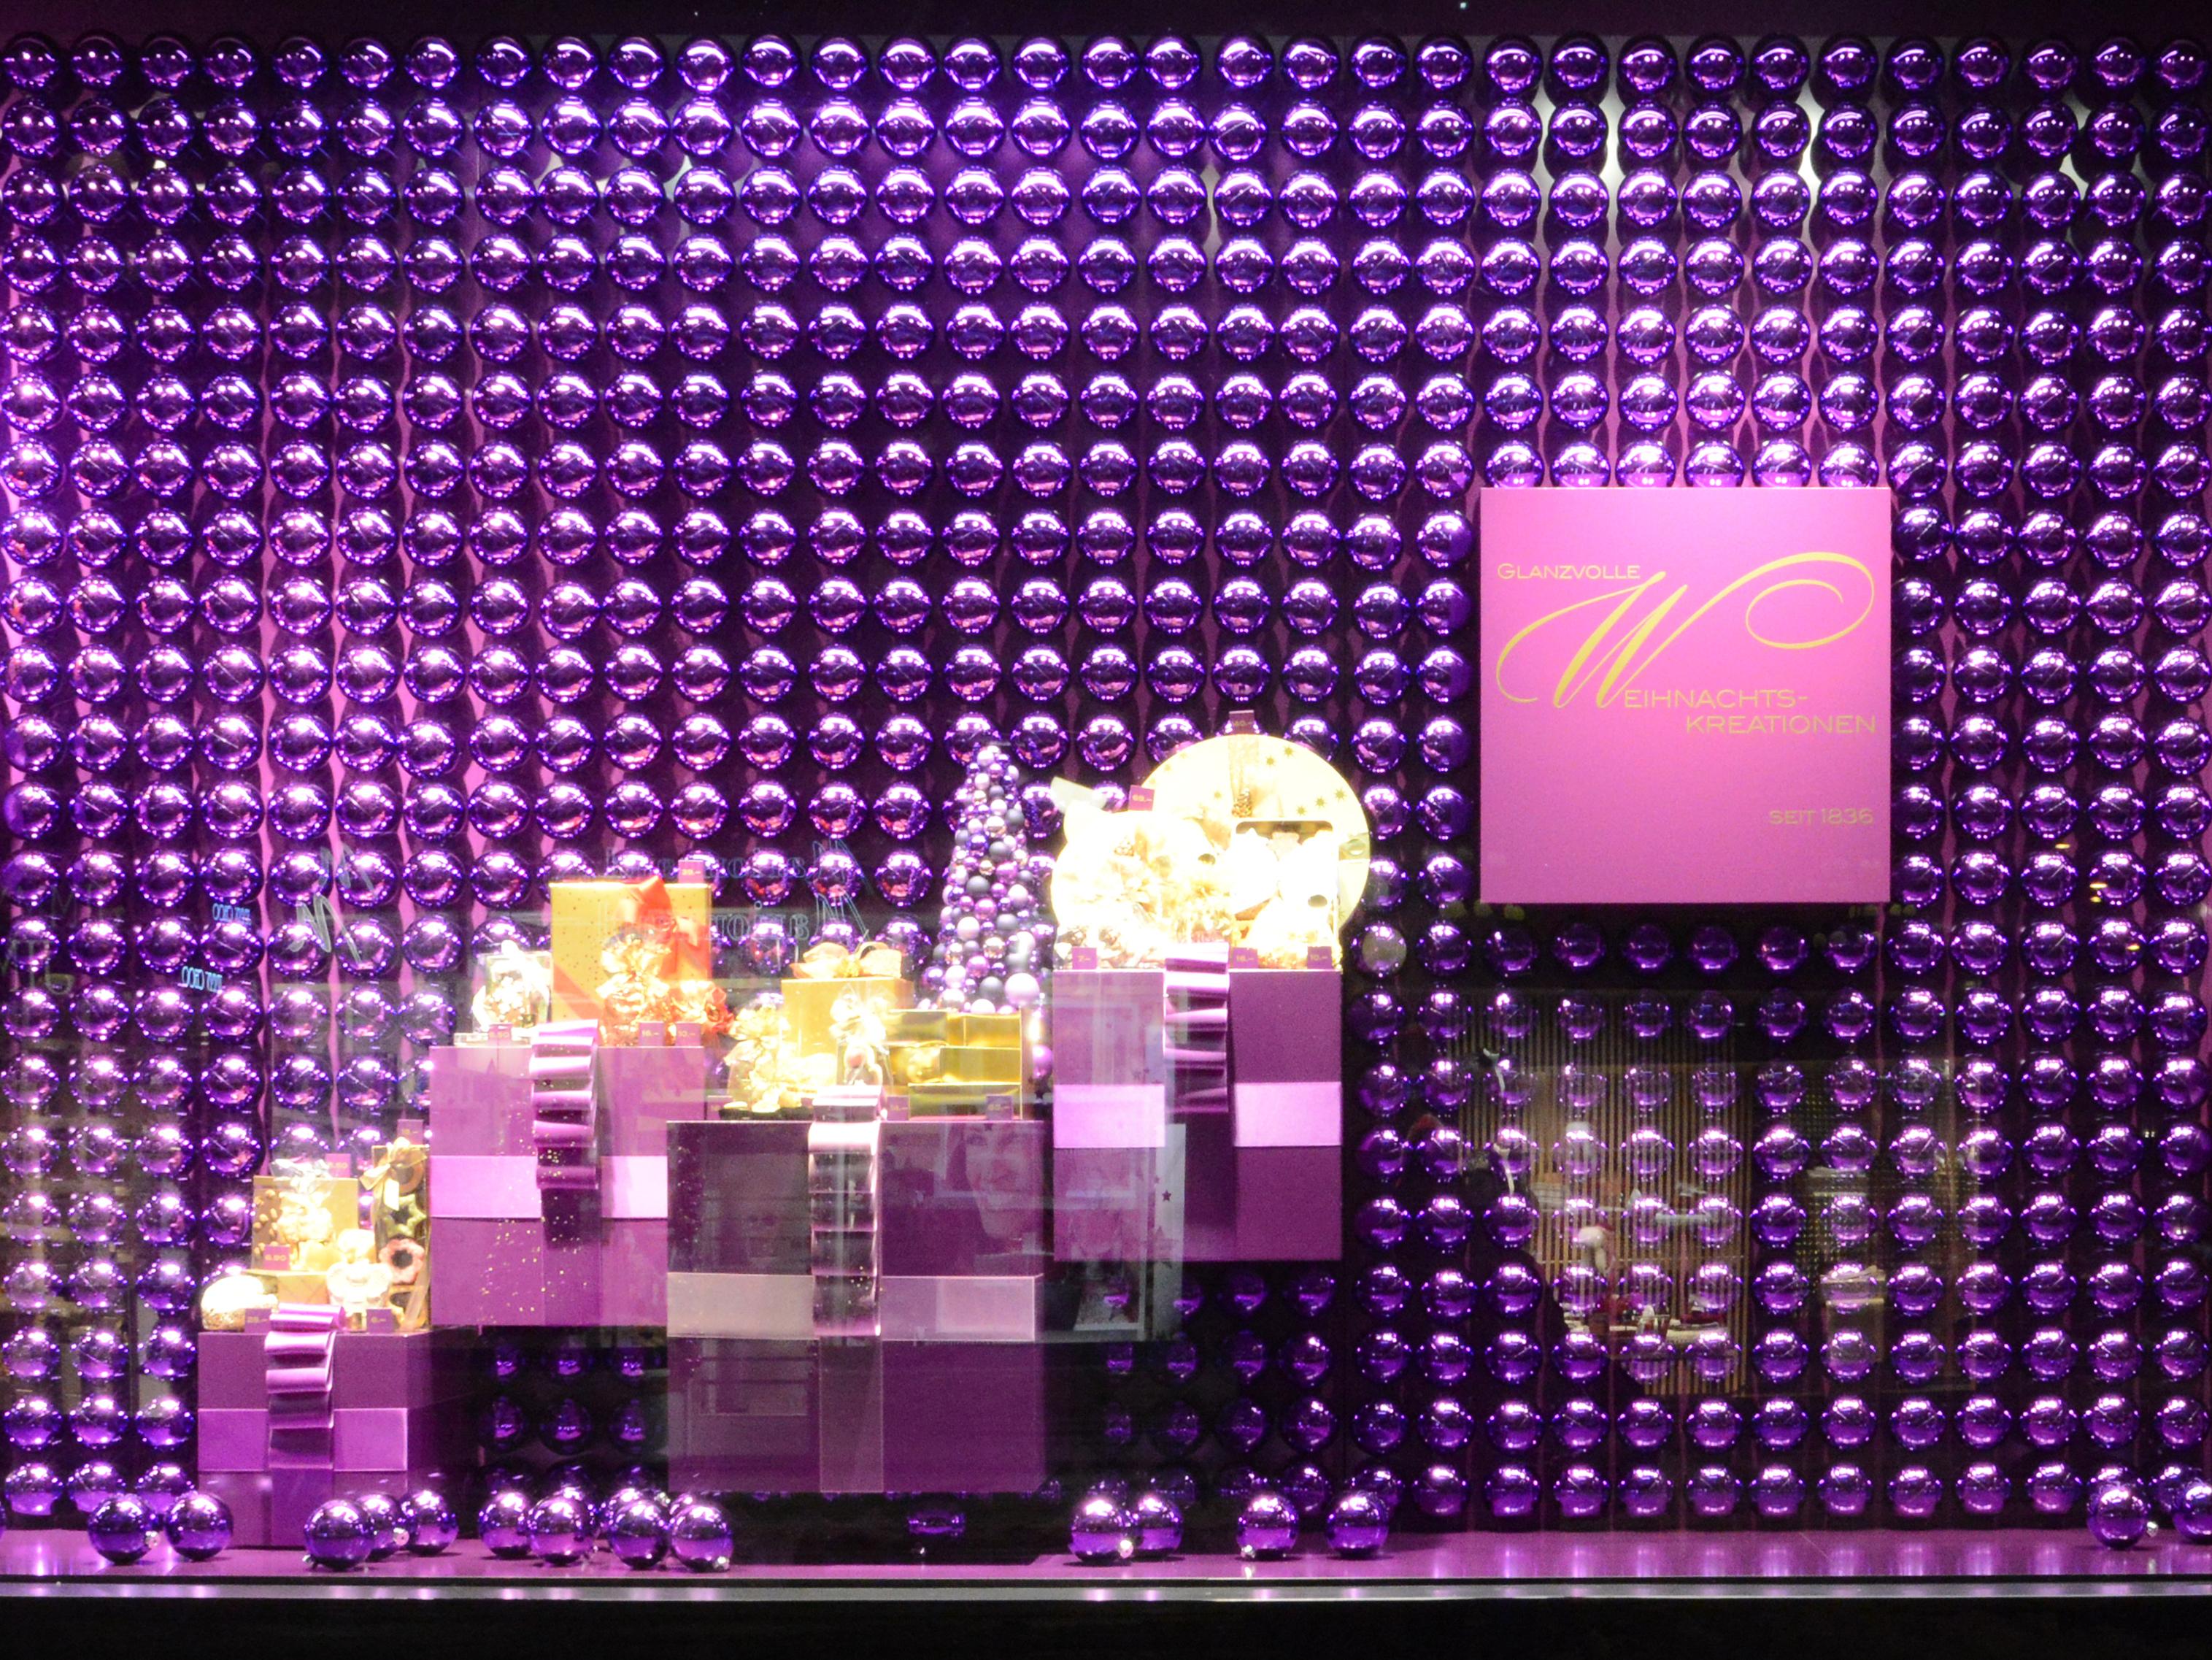 Confiserie Spruengli Schaufenster Xmas 2012